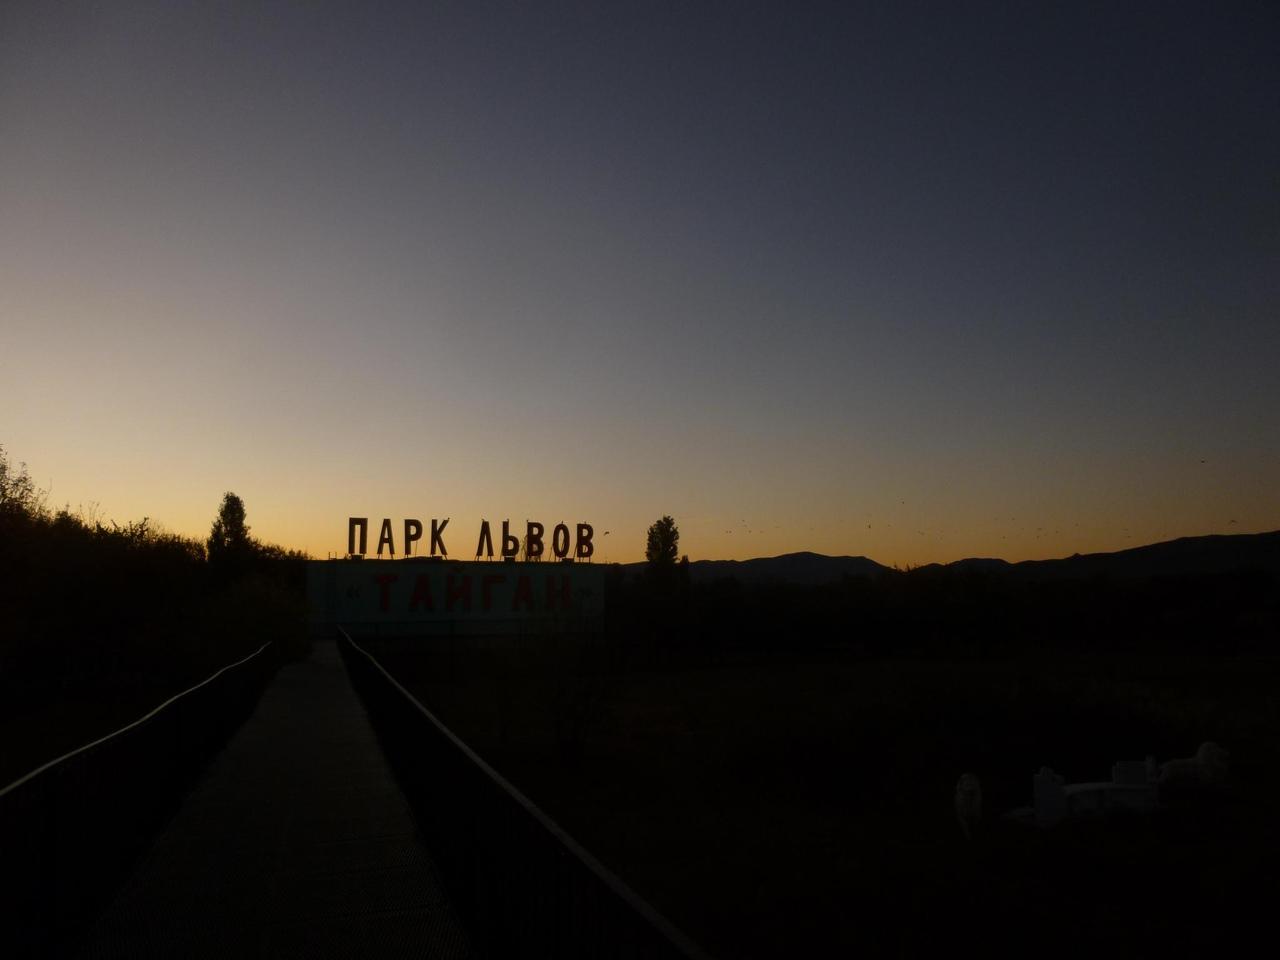 Названа дата открытия парка «Тайган» в Крыму